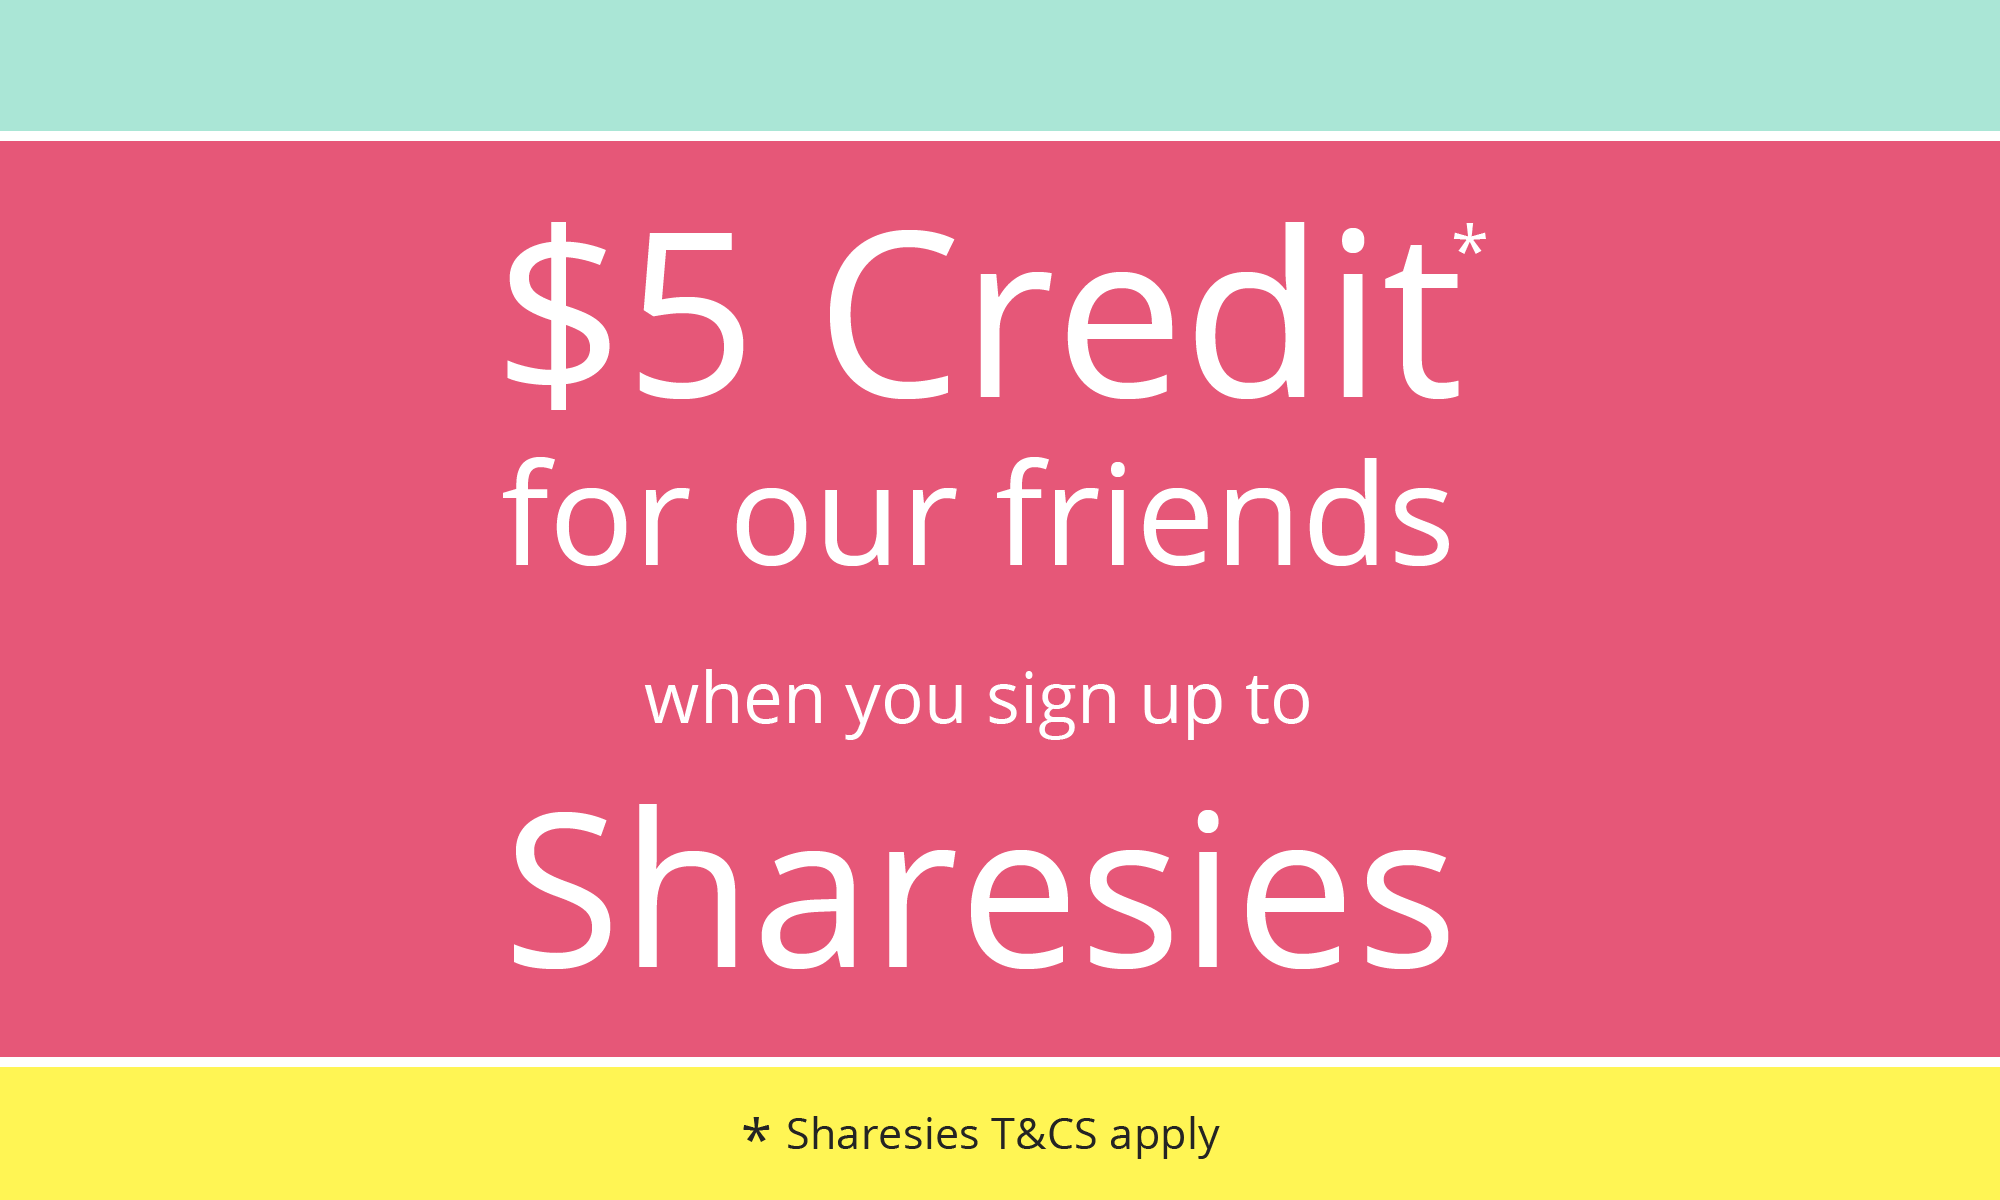 Sharesies Promo Code